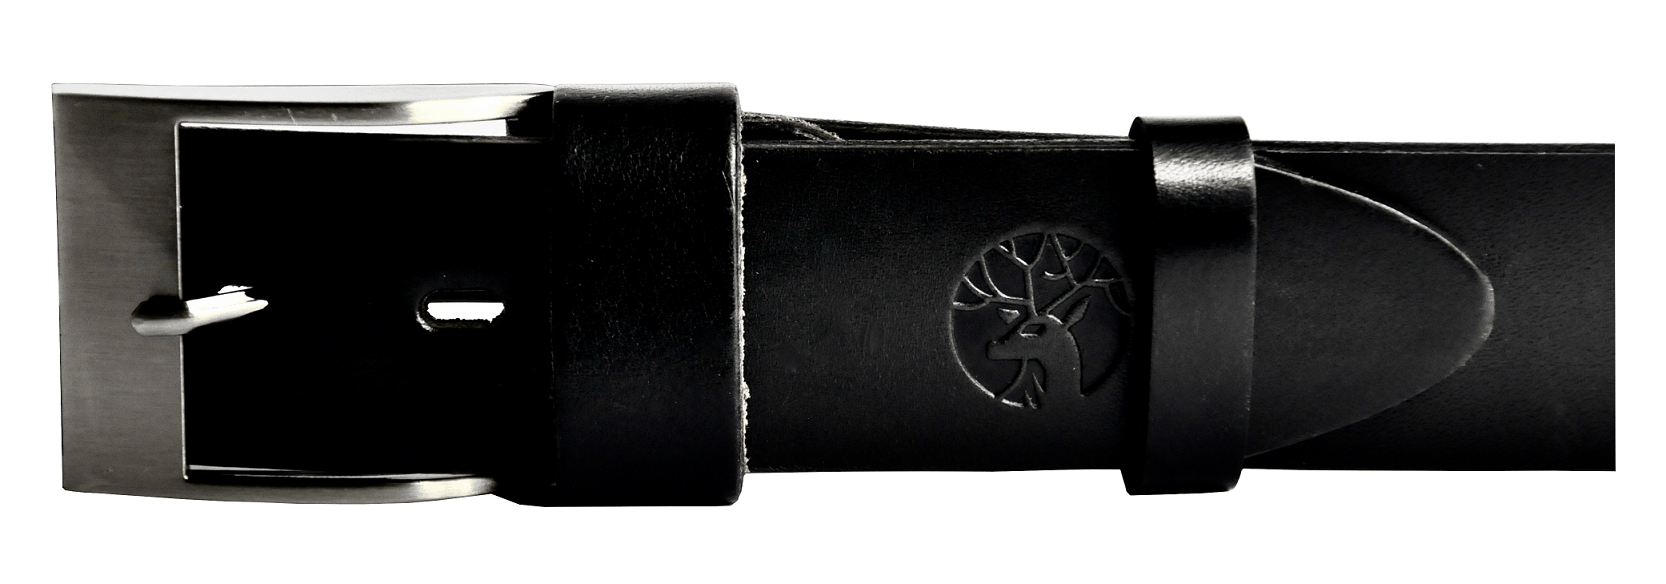 Pasek ze skóry czarny klamra klasyczna szeroki 4 cm